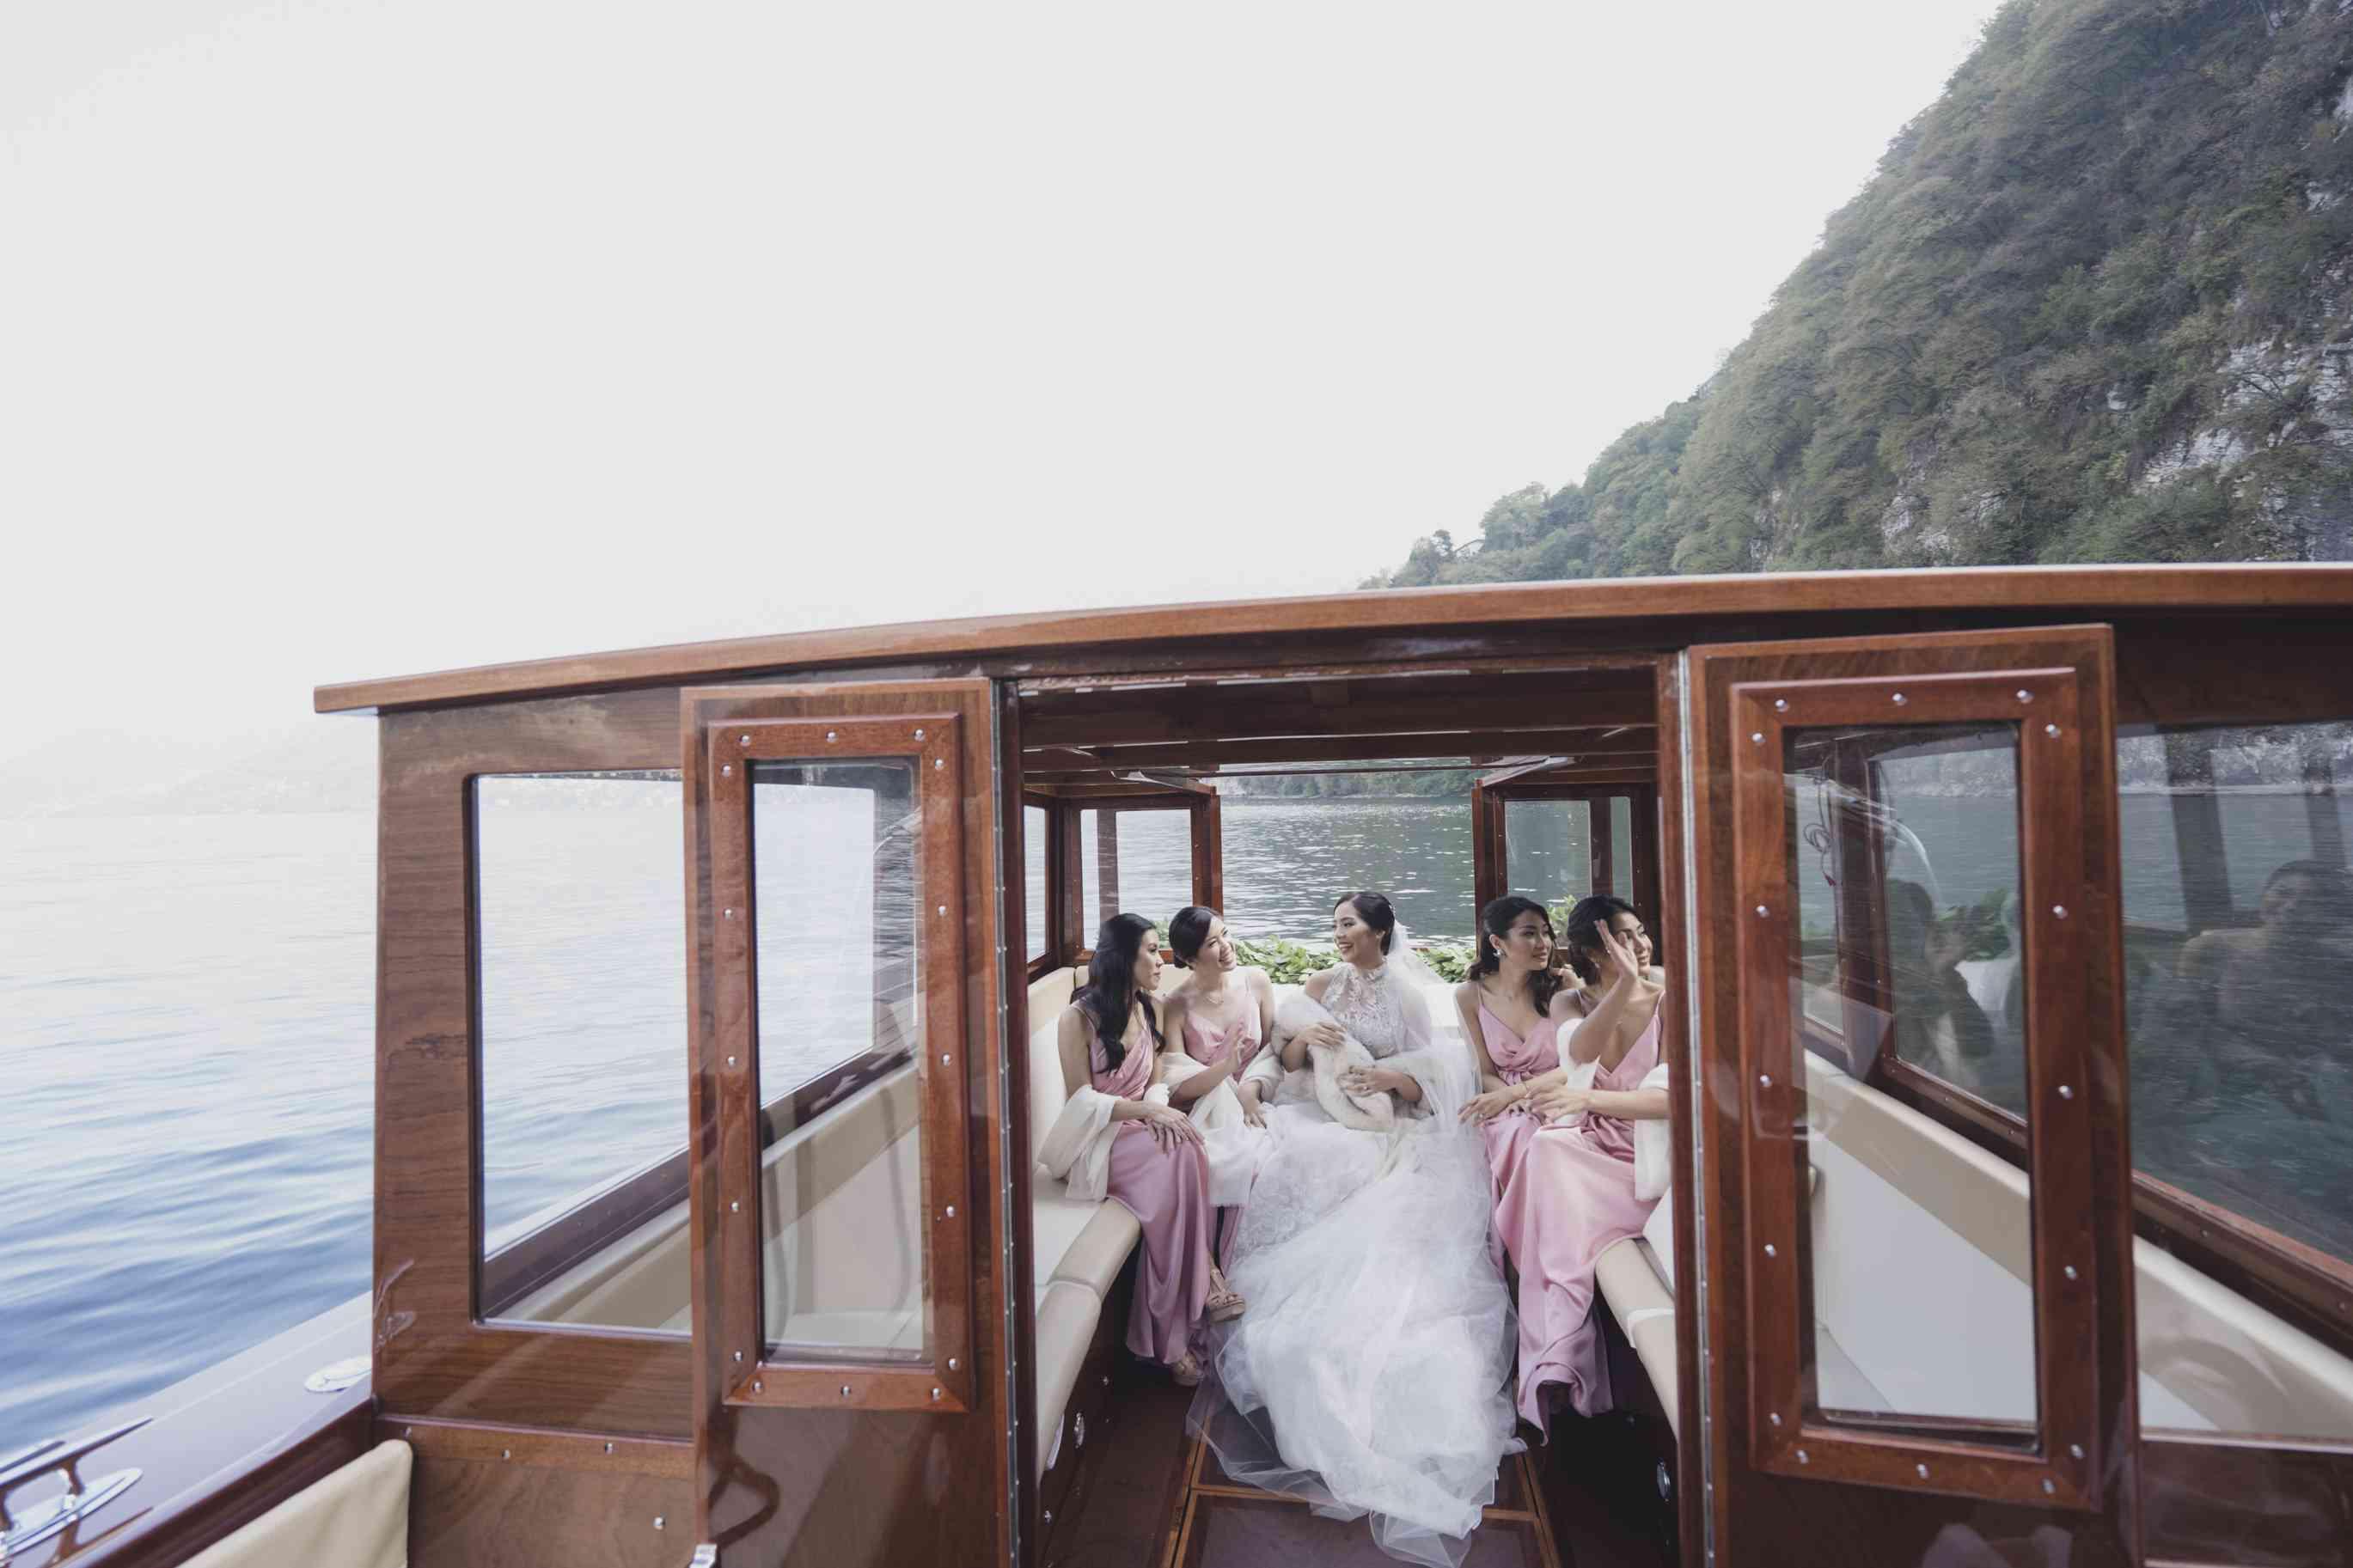 bride in boat with bridesmaids